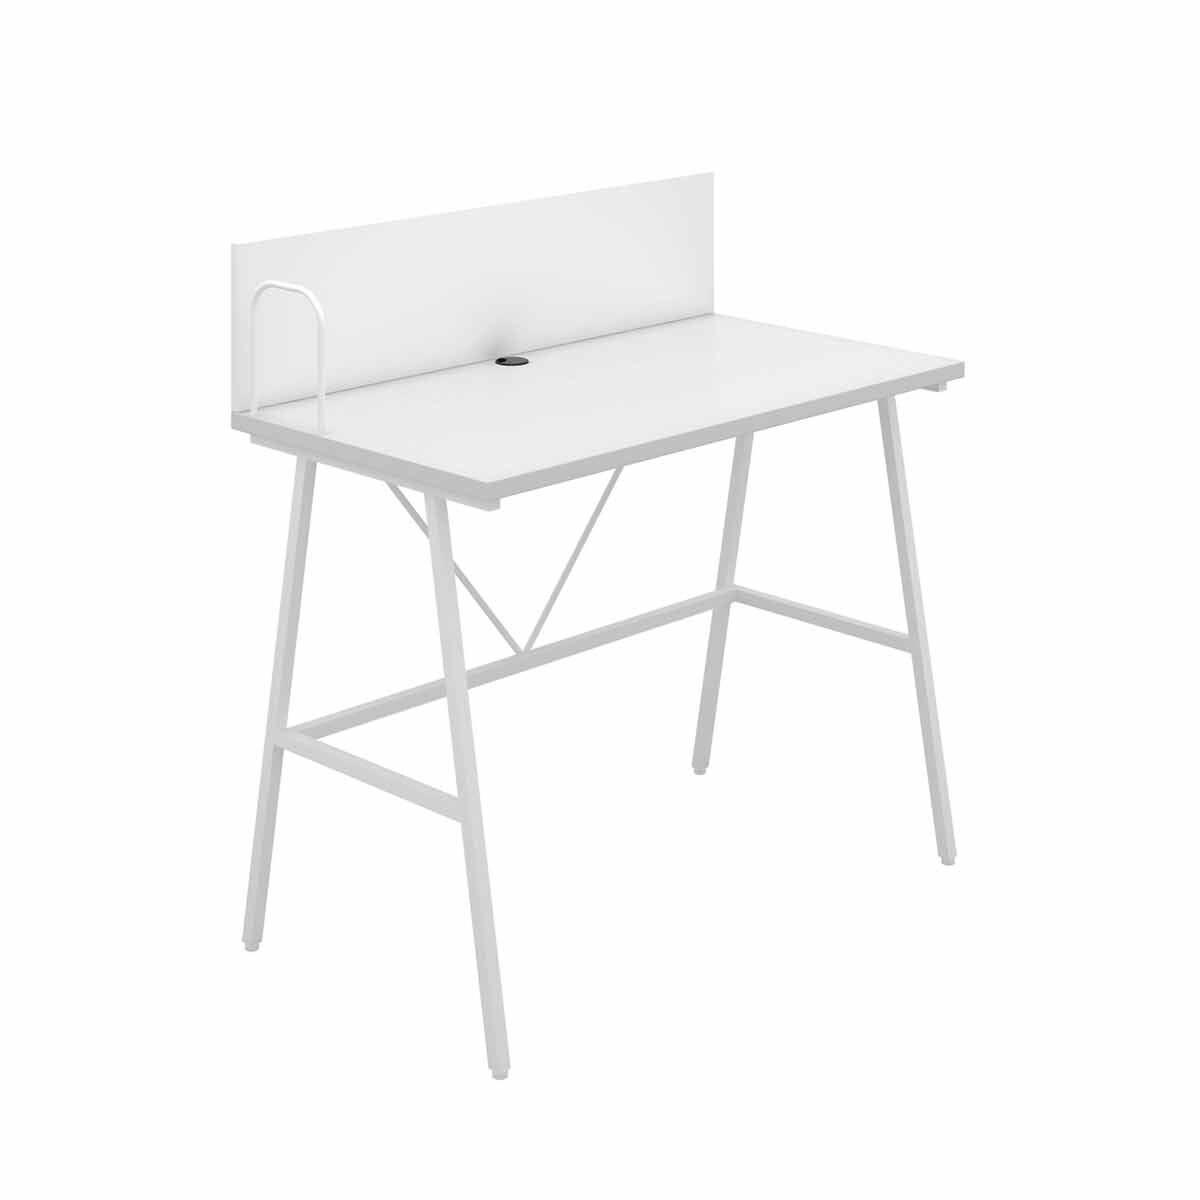 TC Office SOHO Home Working A-Frame Desk with Backboard